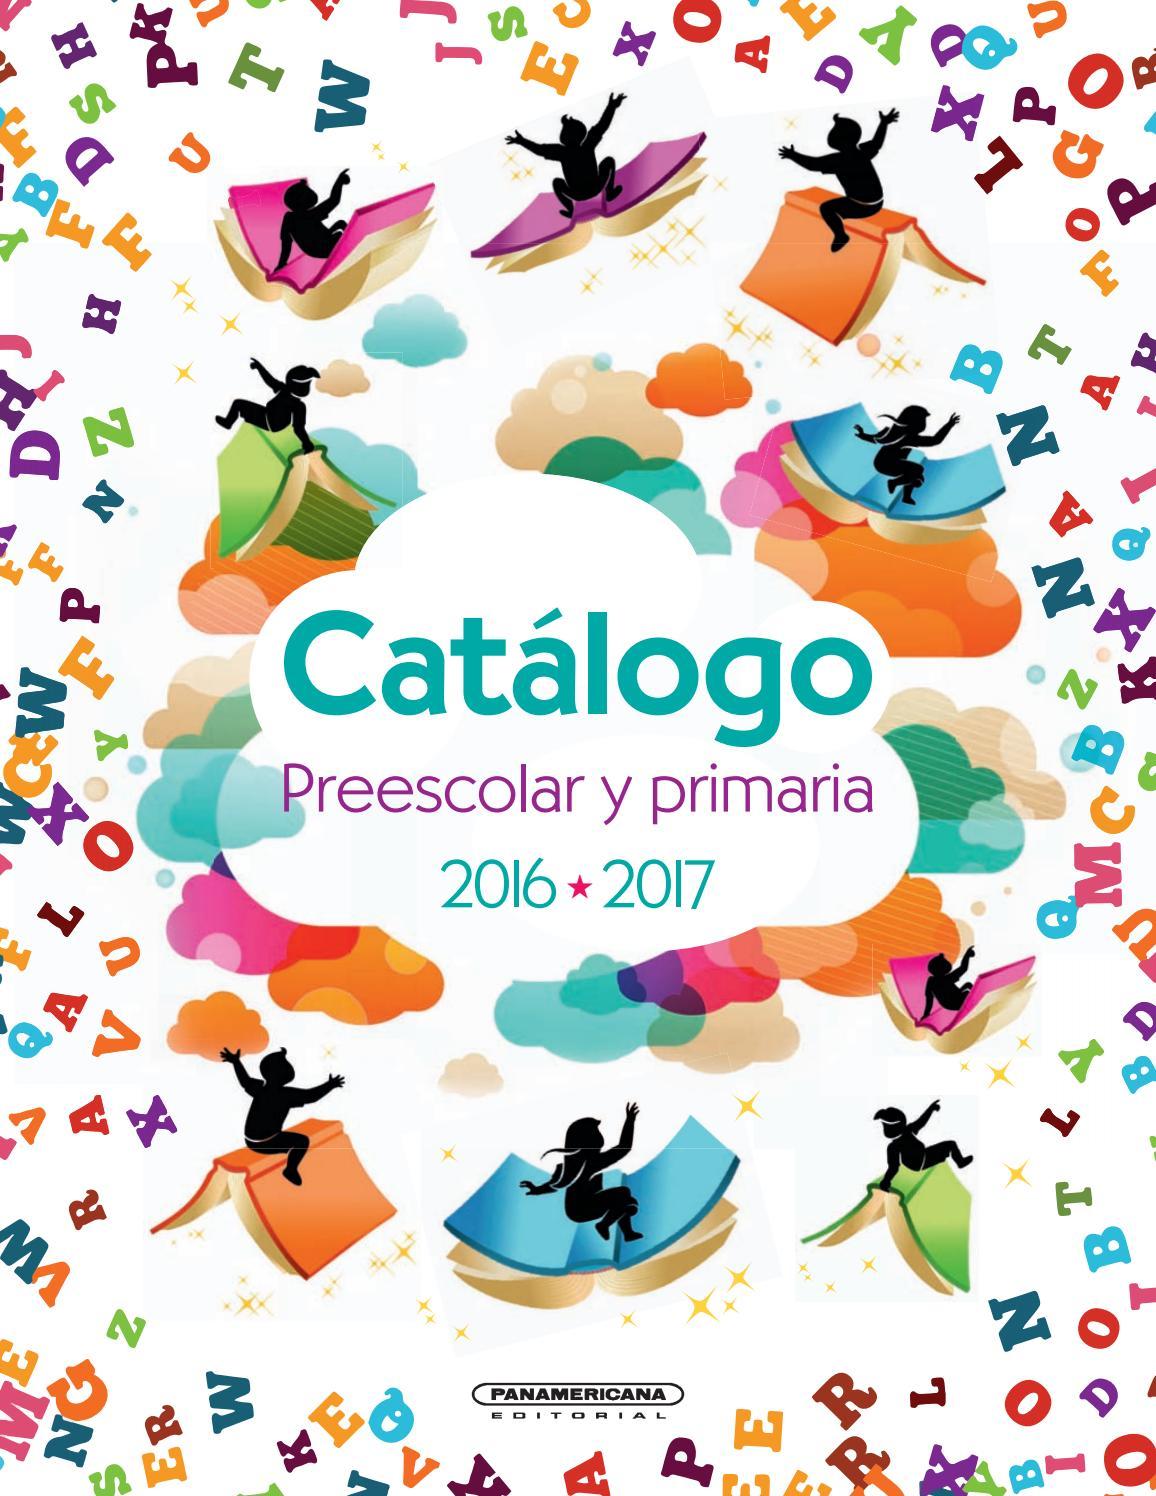 Catálogo primaria 2016 editorial panamericana by Editorial Piedra Santa -  issuu d42eb05d261